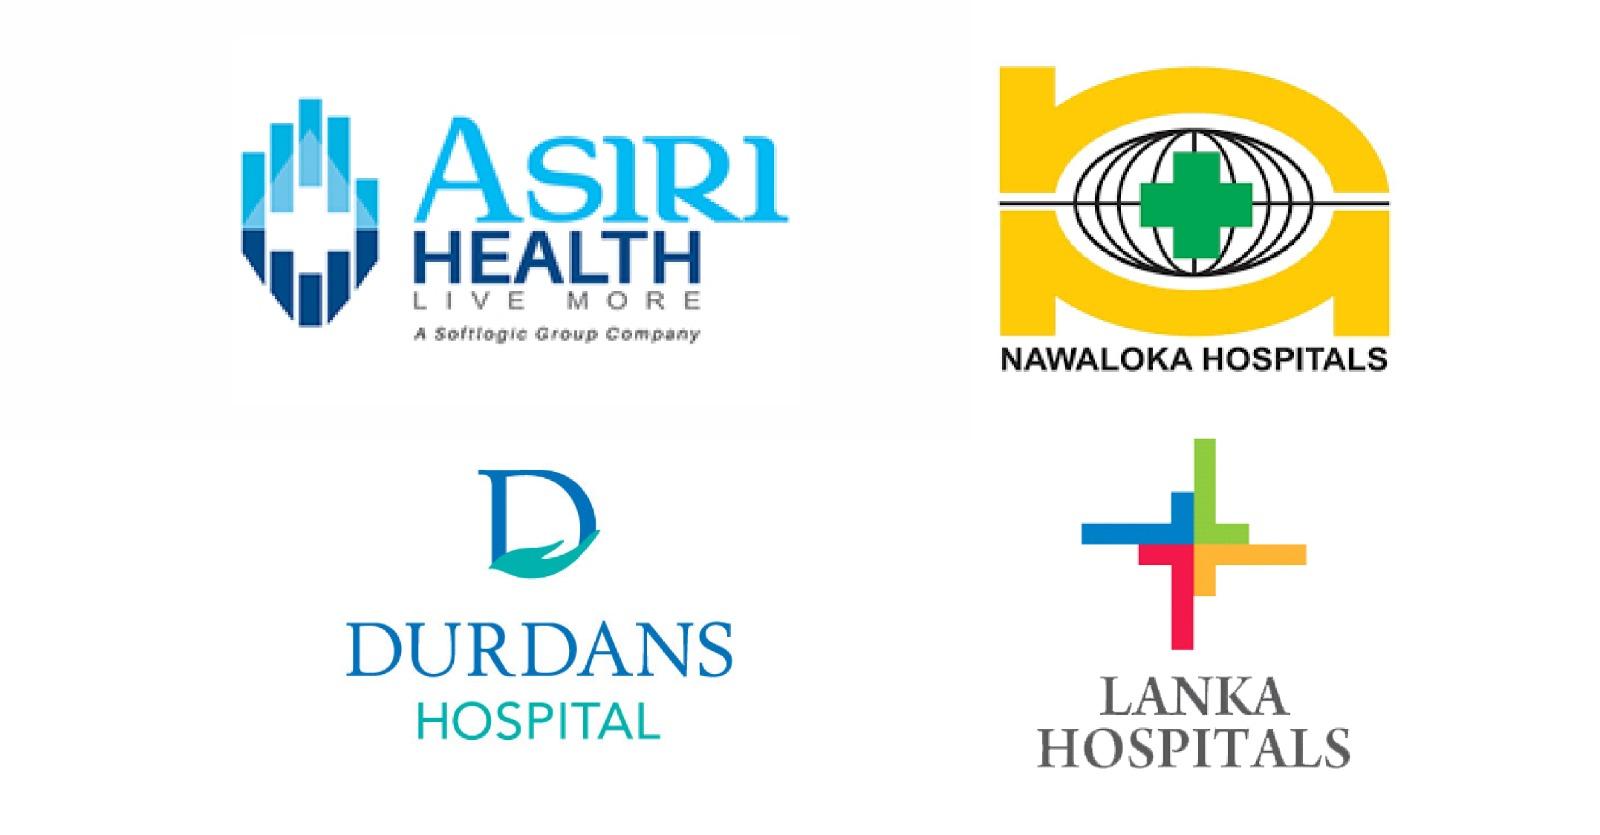 Laboratories in Sri Lanka